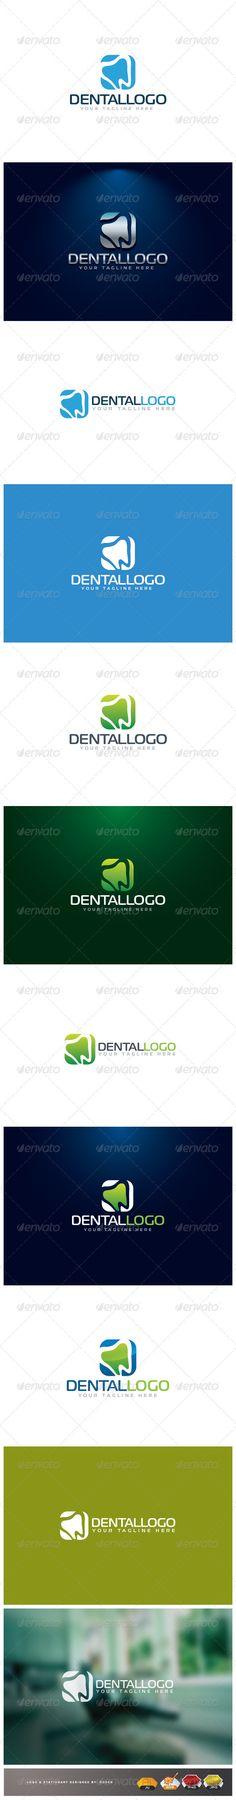 Dental Logo — Vector EPS #professional #dental • Available here → https://graphicriver.net/item/dental-logo/3498894?ref=pxcr